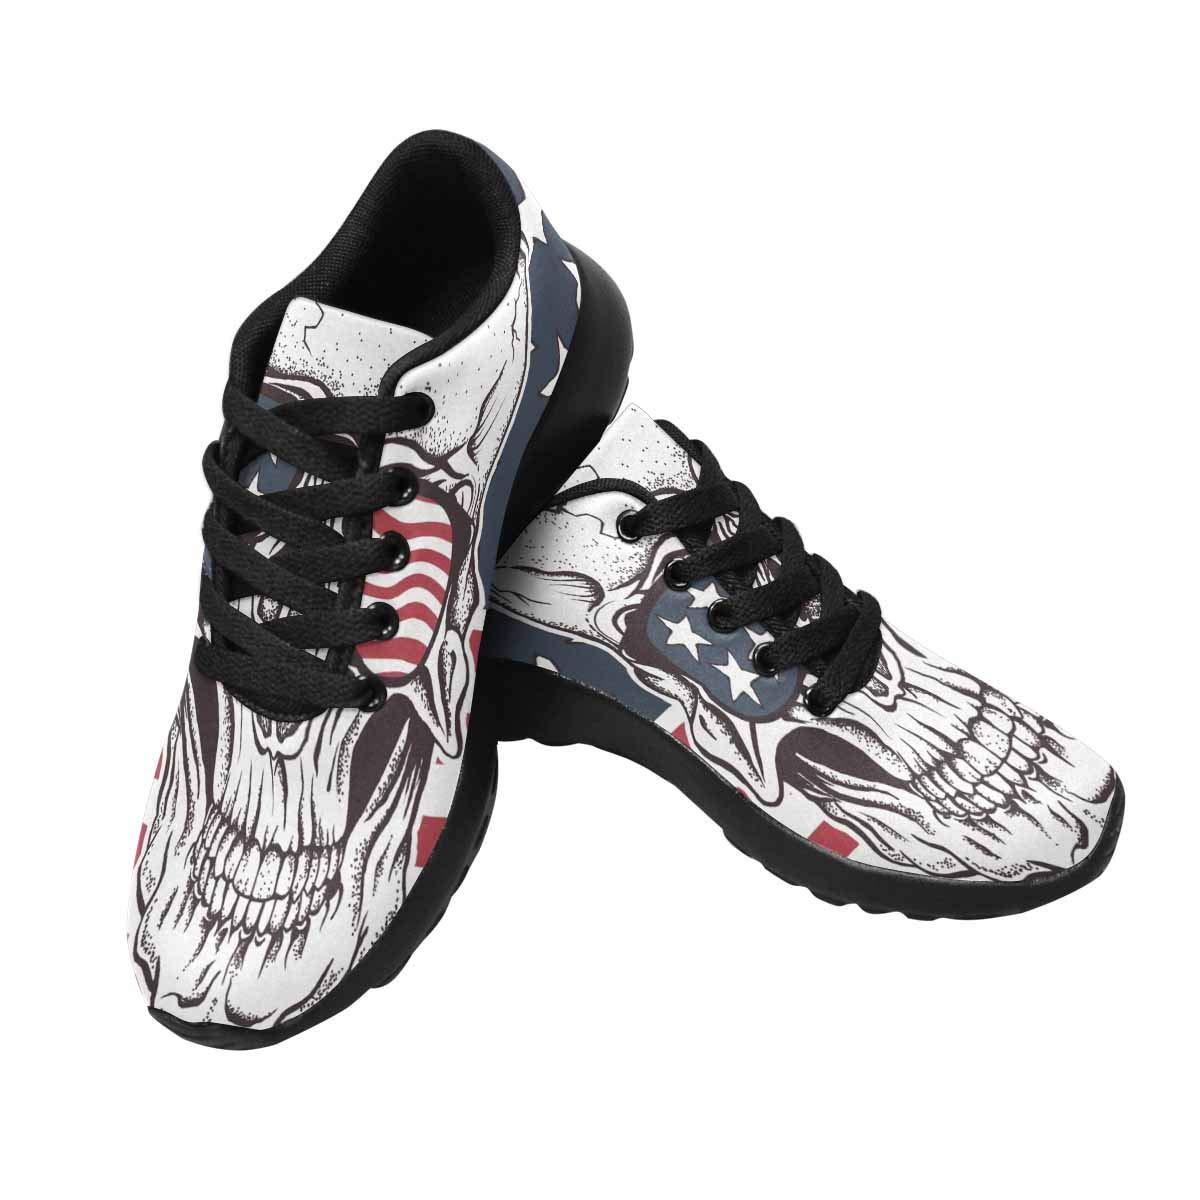 InterestPrint Women's Trail Running Shoes Cool Sugar Skull in Sunglasses US10